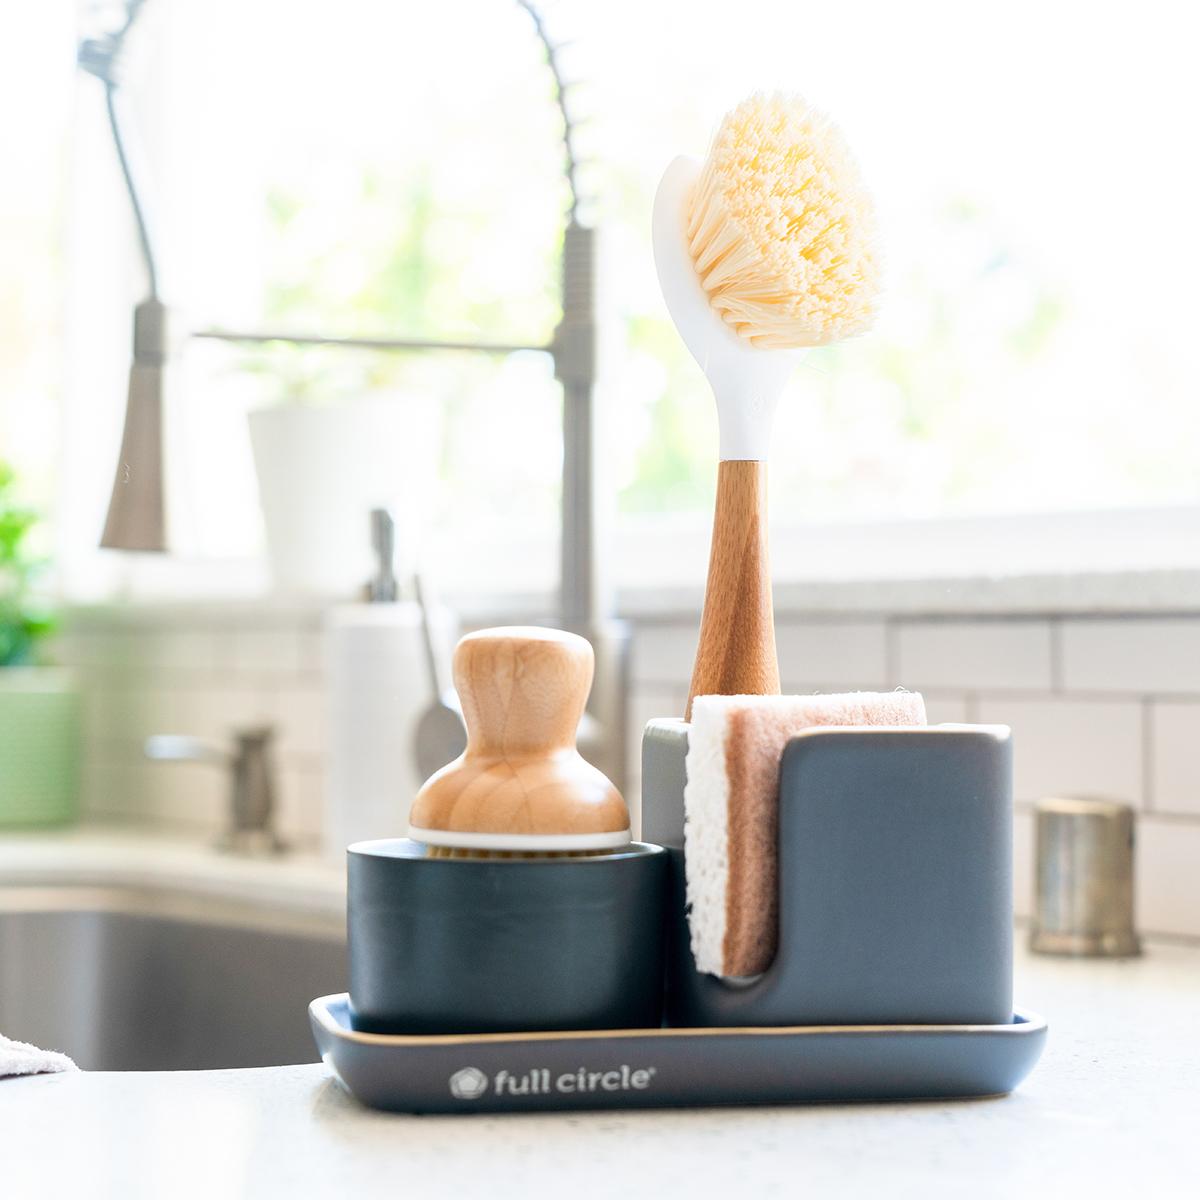 Full Circle Modular Ceramic Sink Caddy